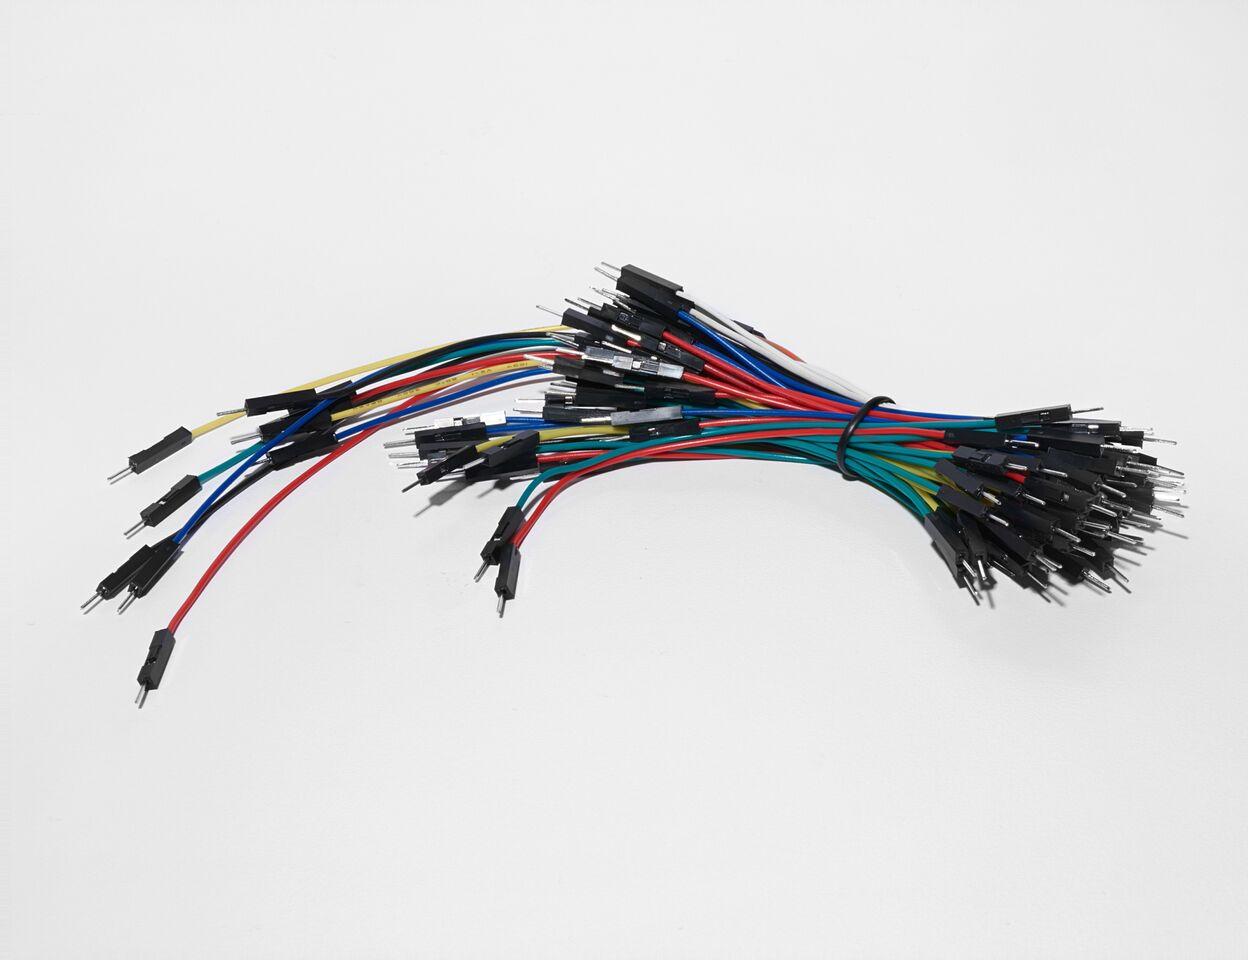 sensors_Breadboard_Wire_Bundle_White_Background_ORIG.jpg